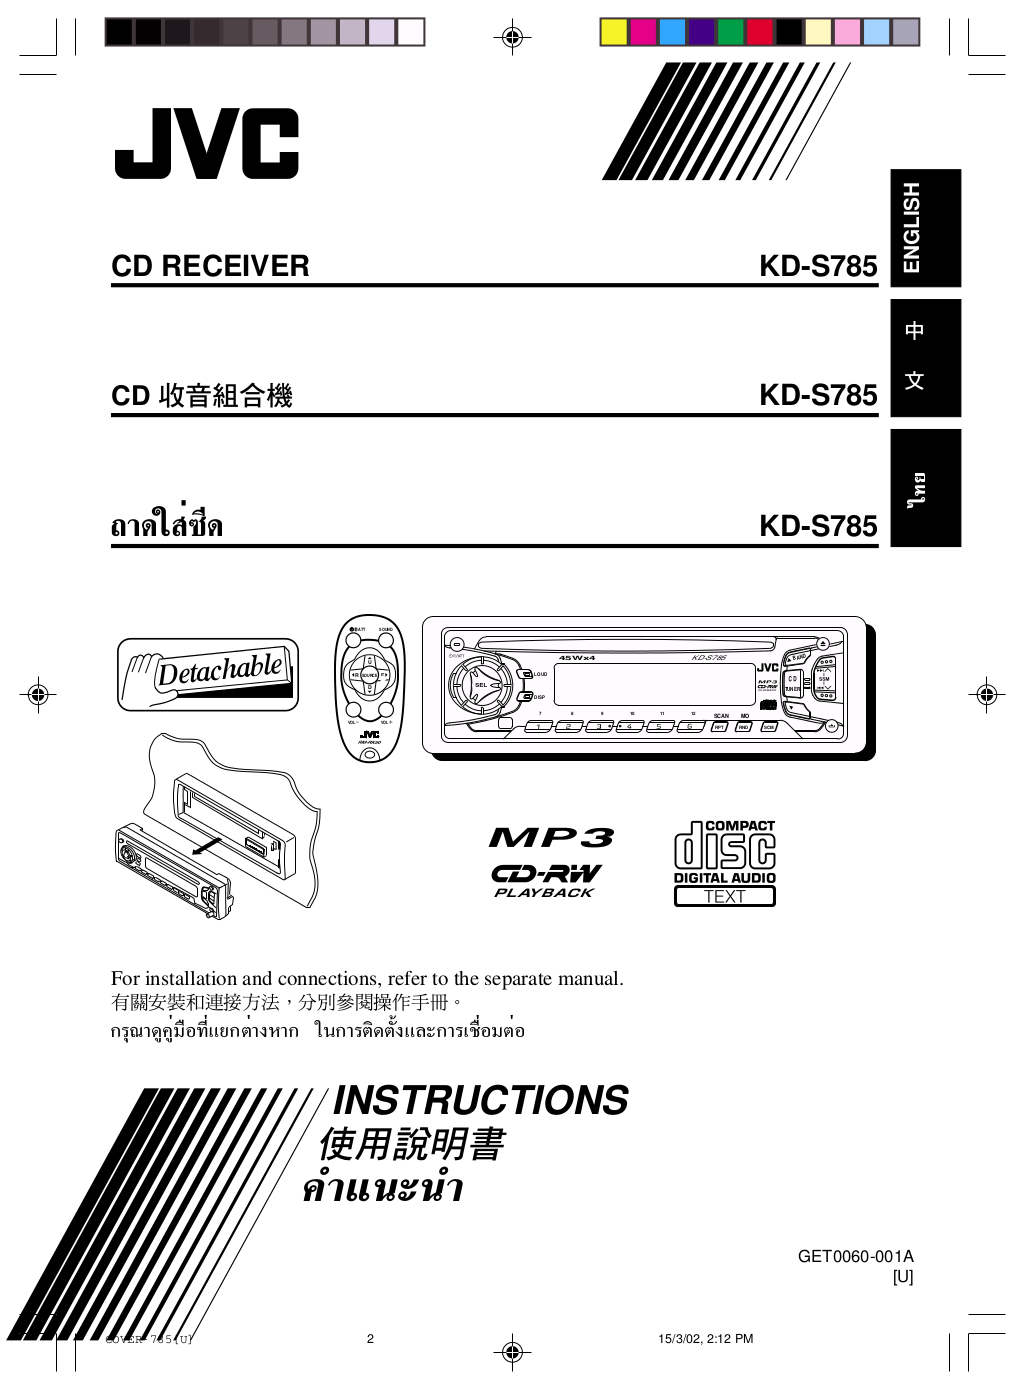 Jvc Kd R326 Wiring Diagram Diagrams R520 Download Free Pdf For S785 Car Receiver Manual R320